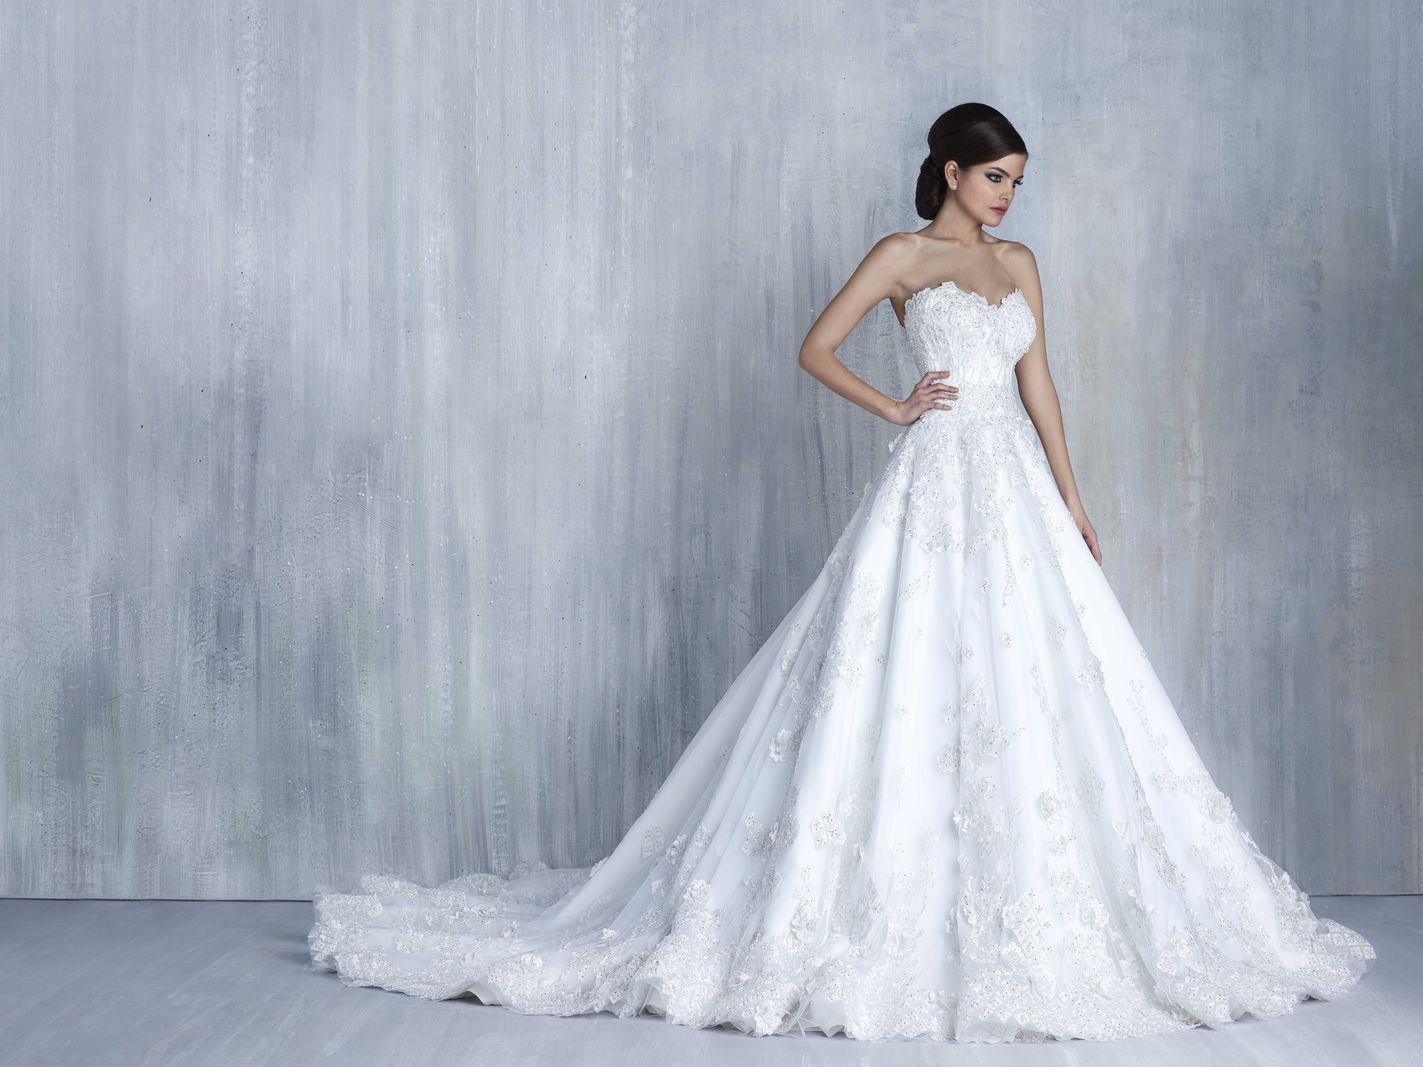 Tony Chaaya Haute Couture Wedding Dresses